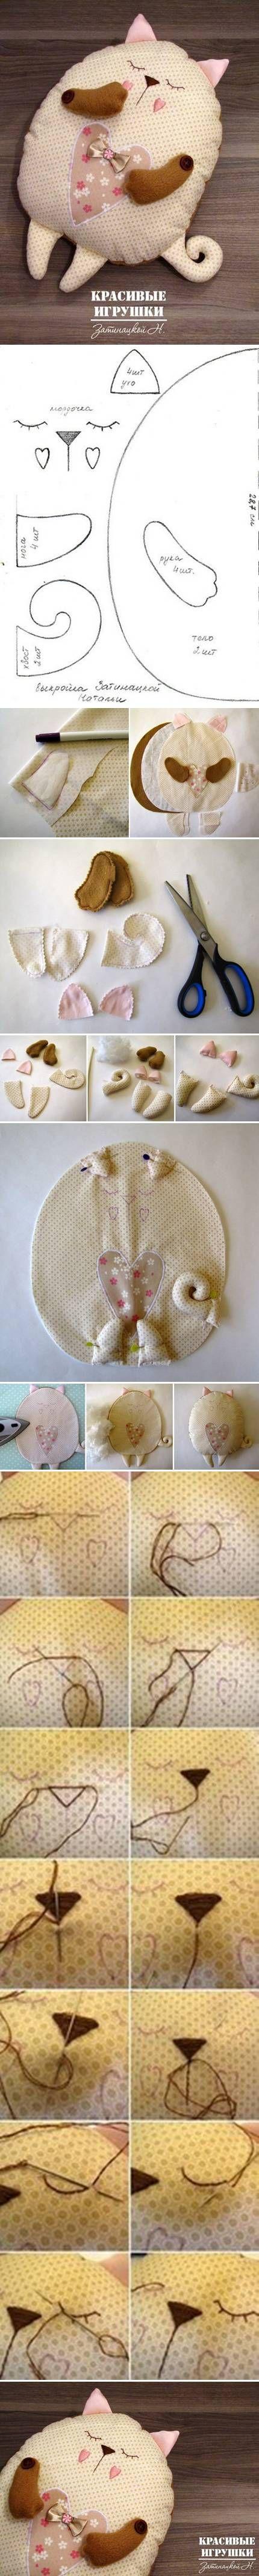 Cojines para tu Bebe-bebeazul.top (2)